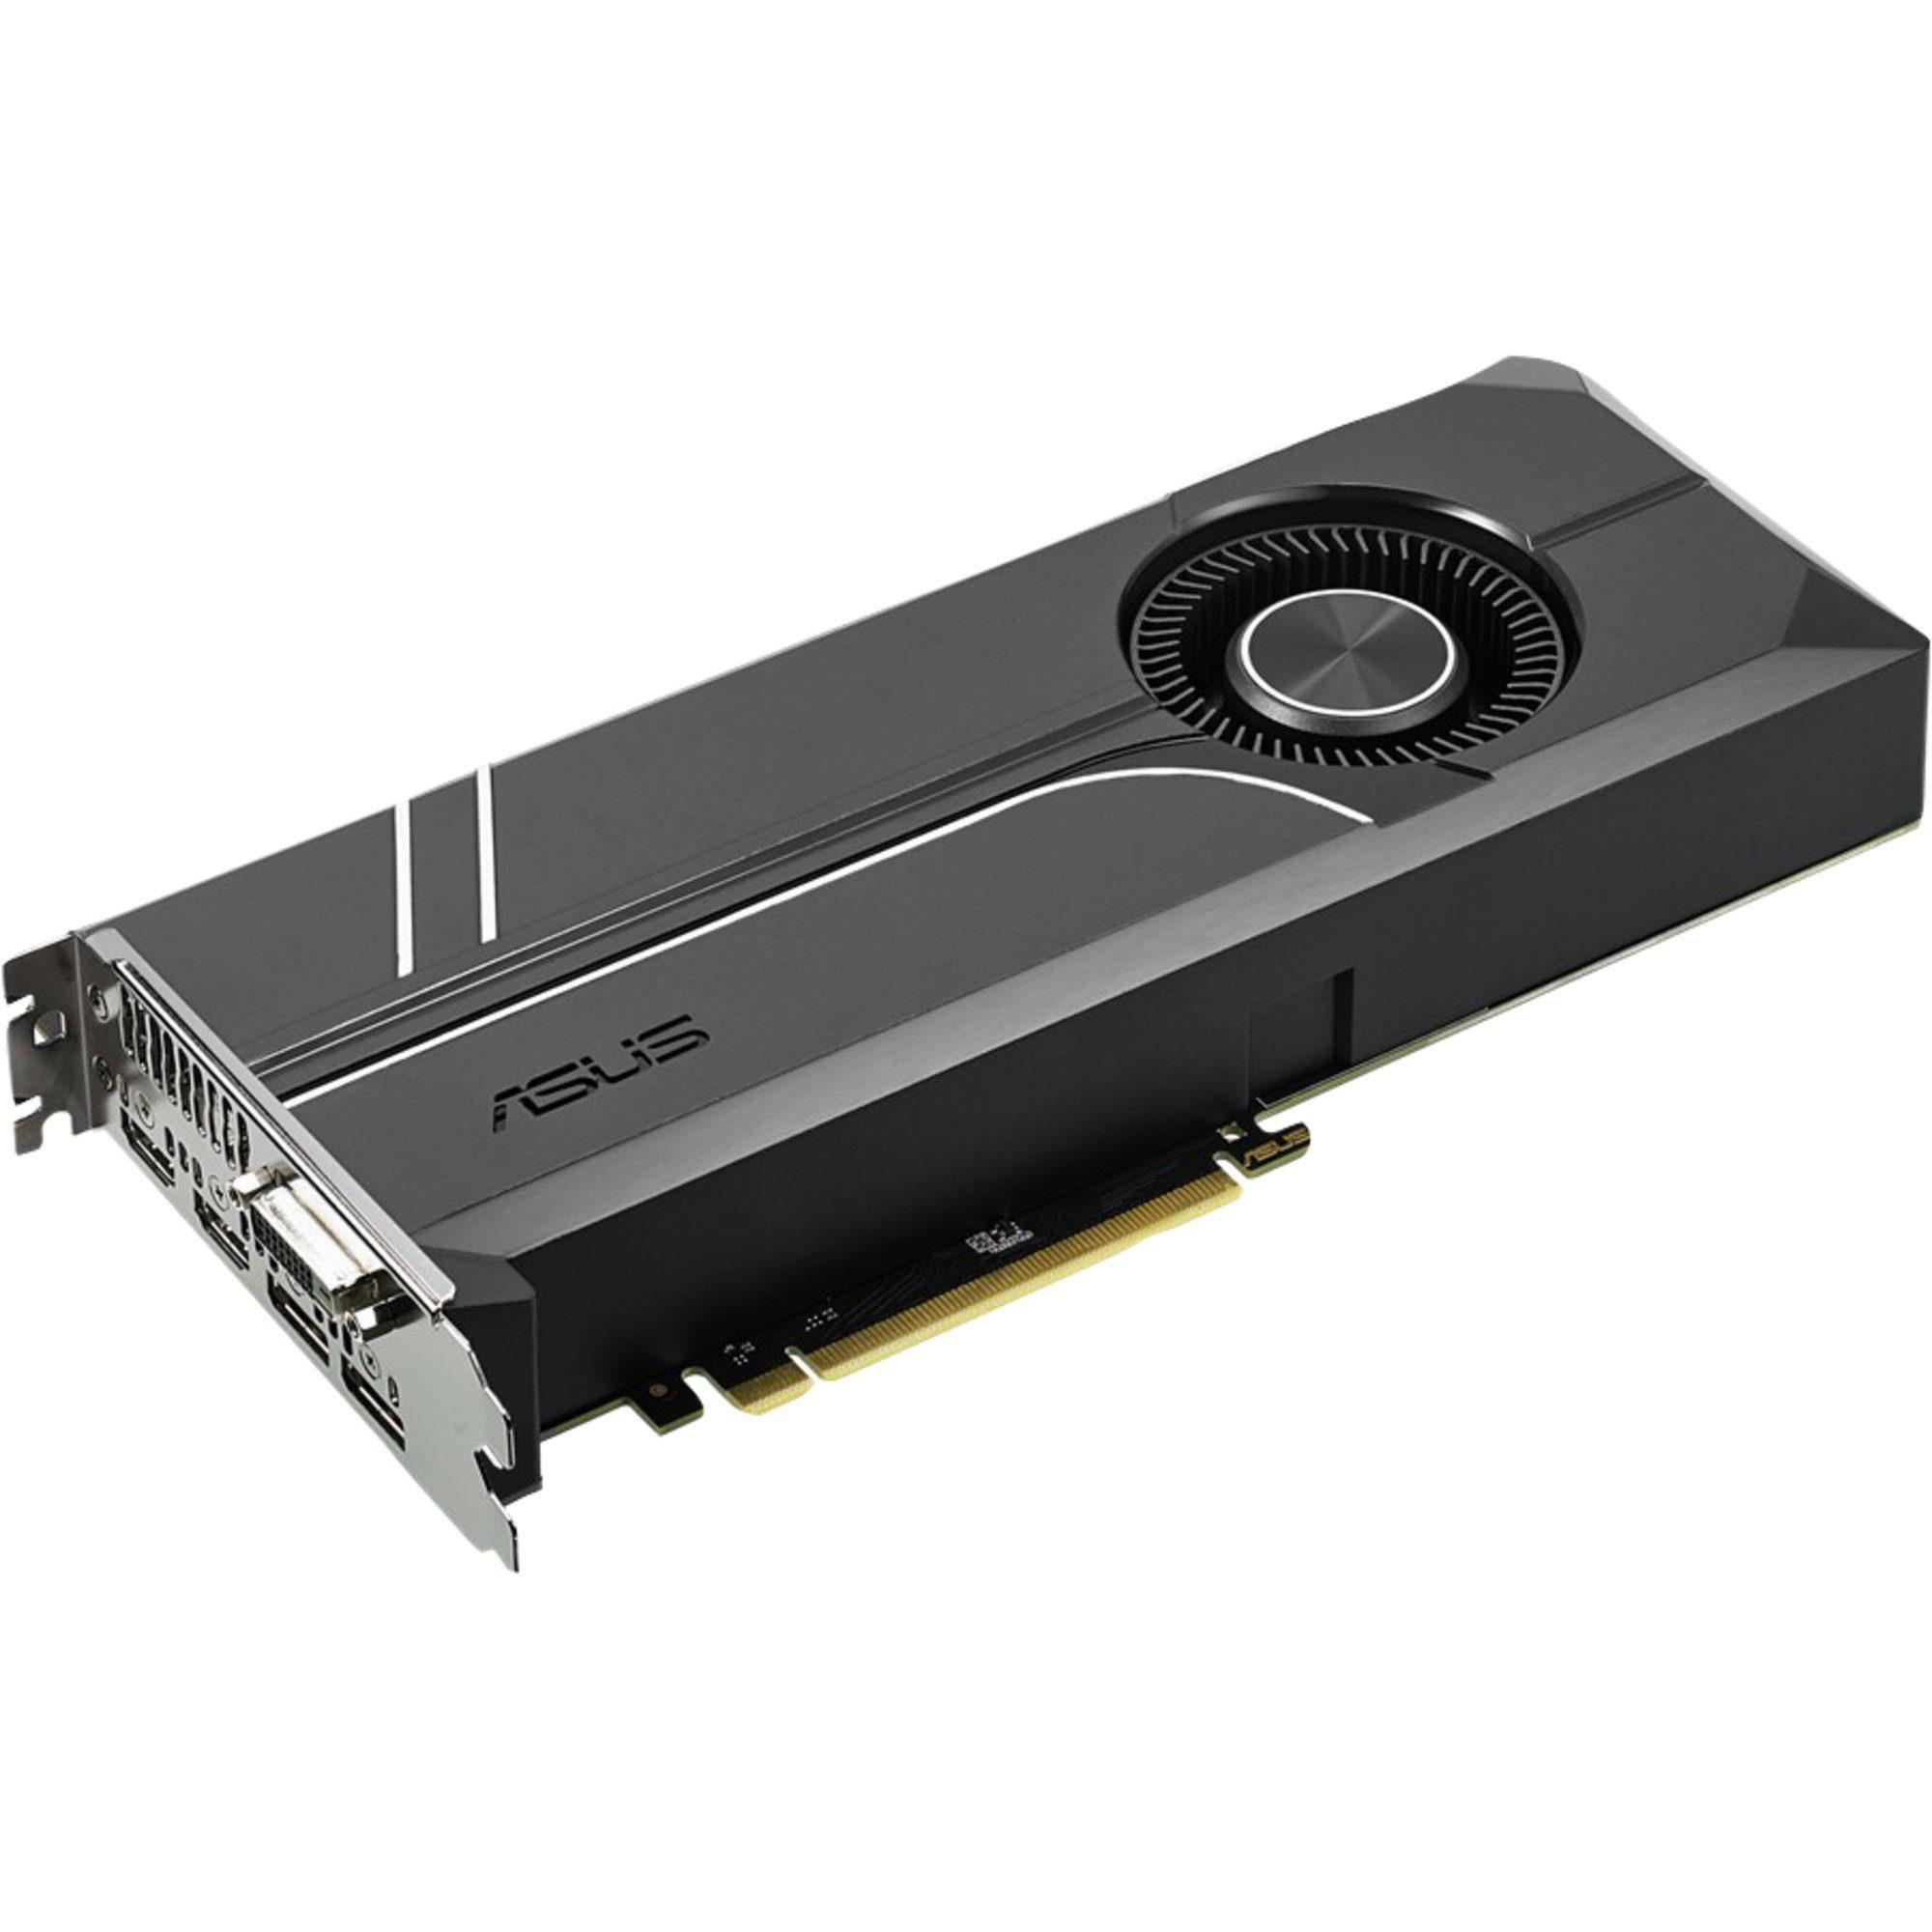 ASUS Grafikkarte »GeForce GTX 1060 TURBO«